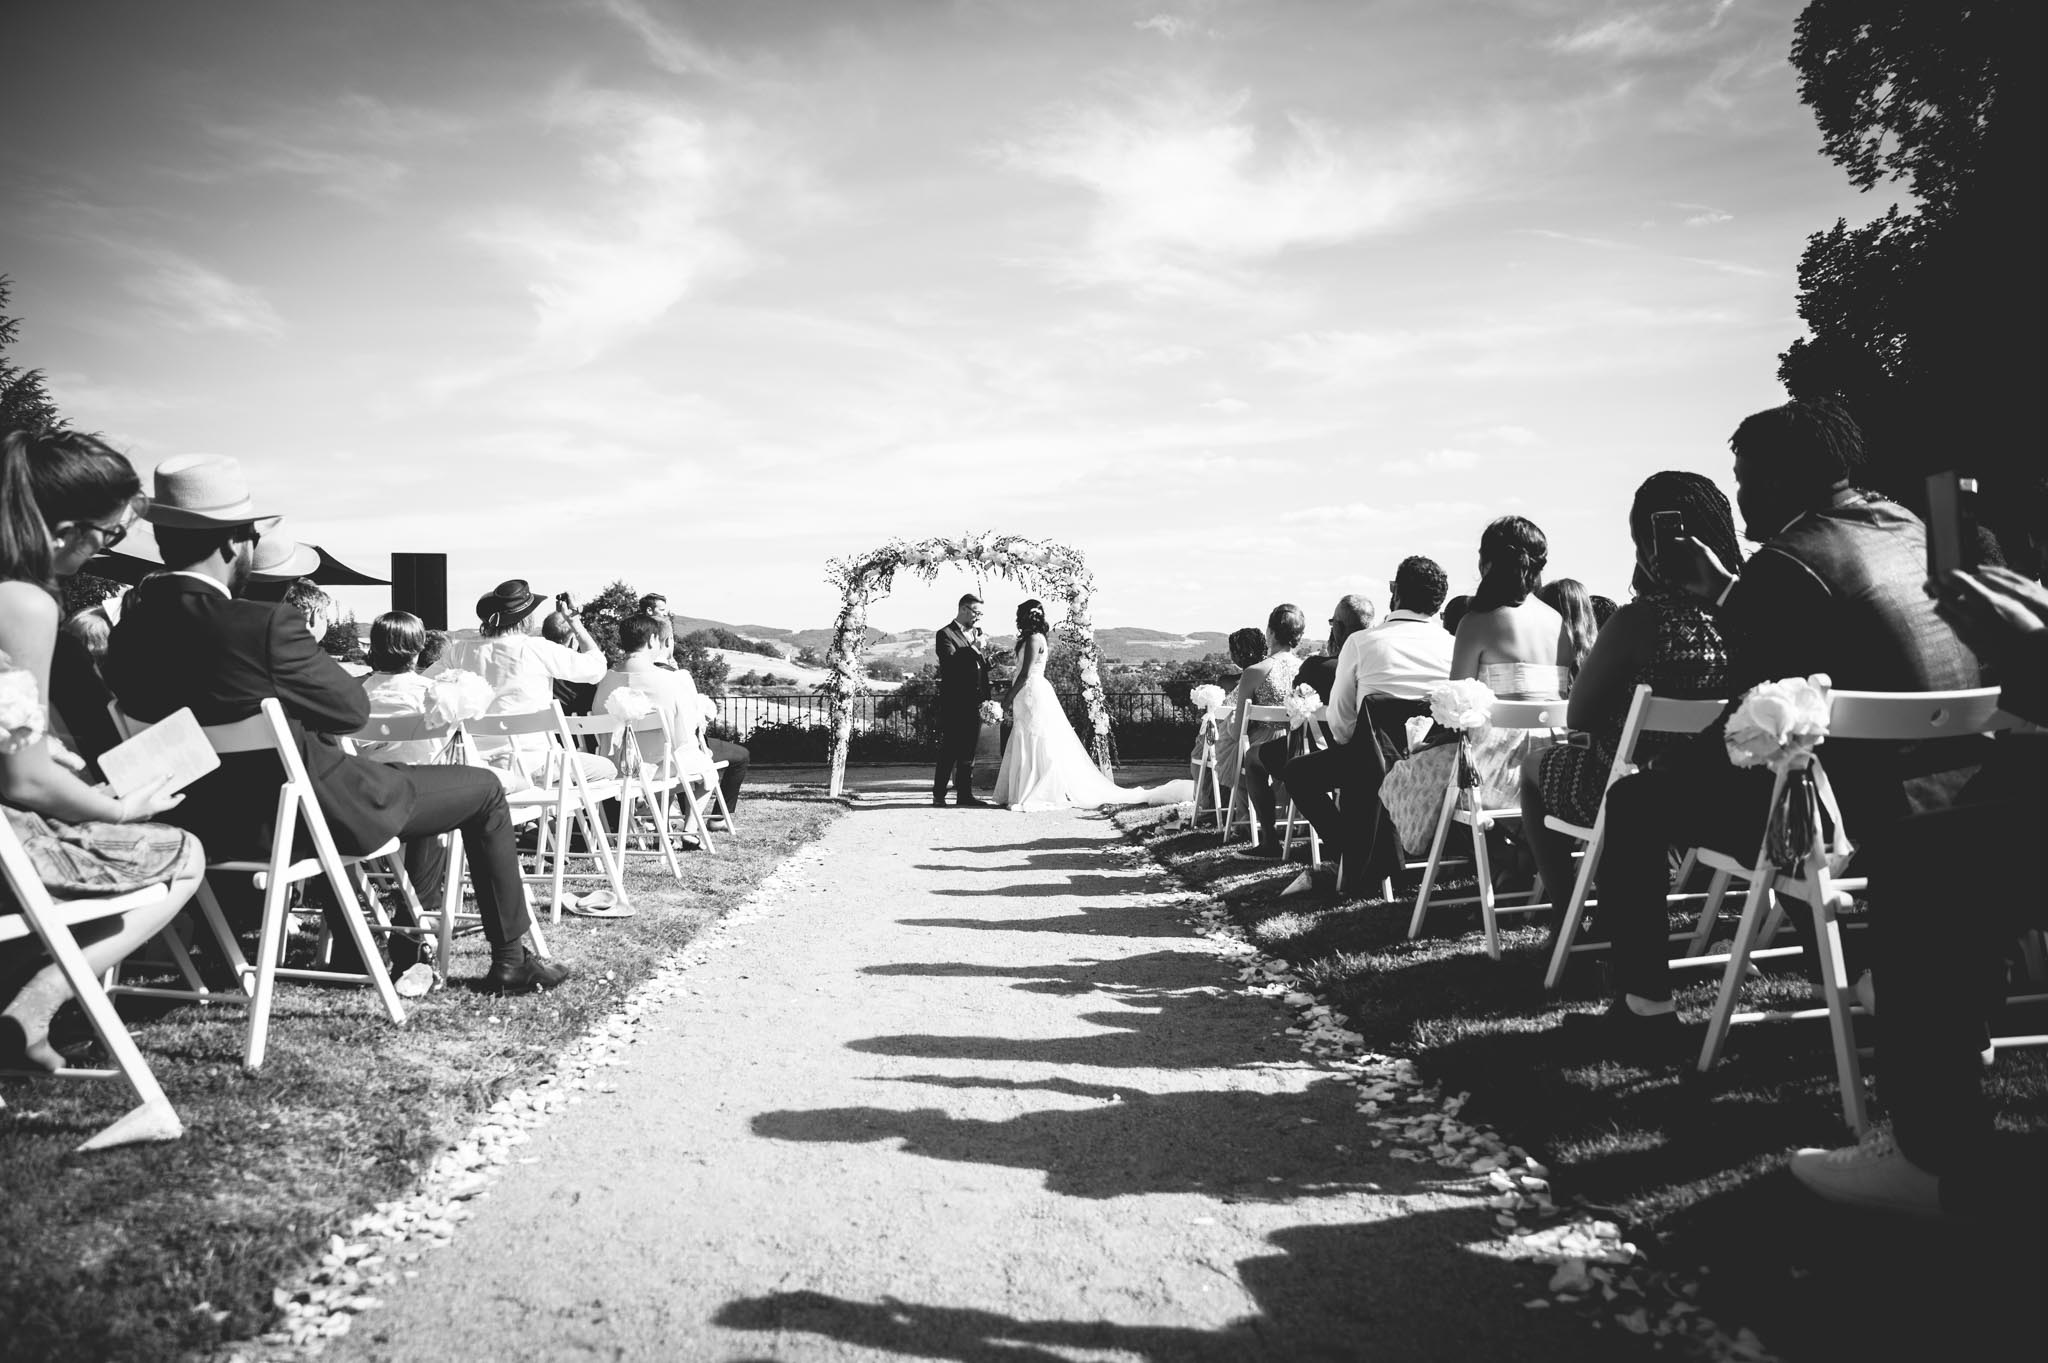 2017-07-15 - DSC_8198 - photographe - mariage - www.lauriediazwedding.com.jpg